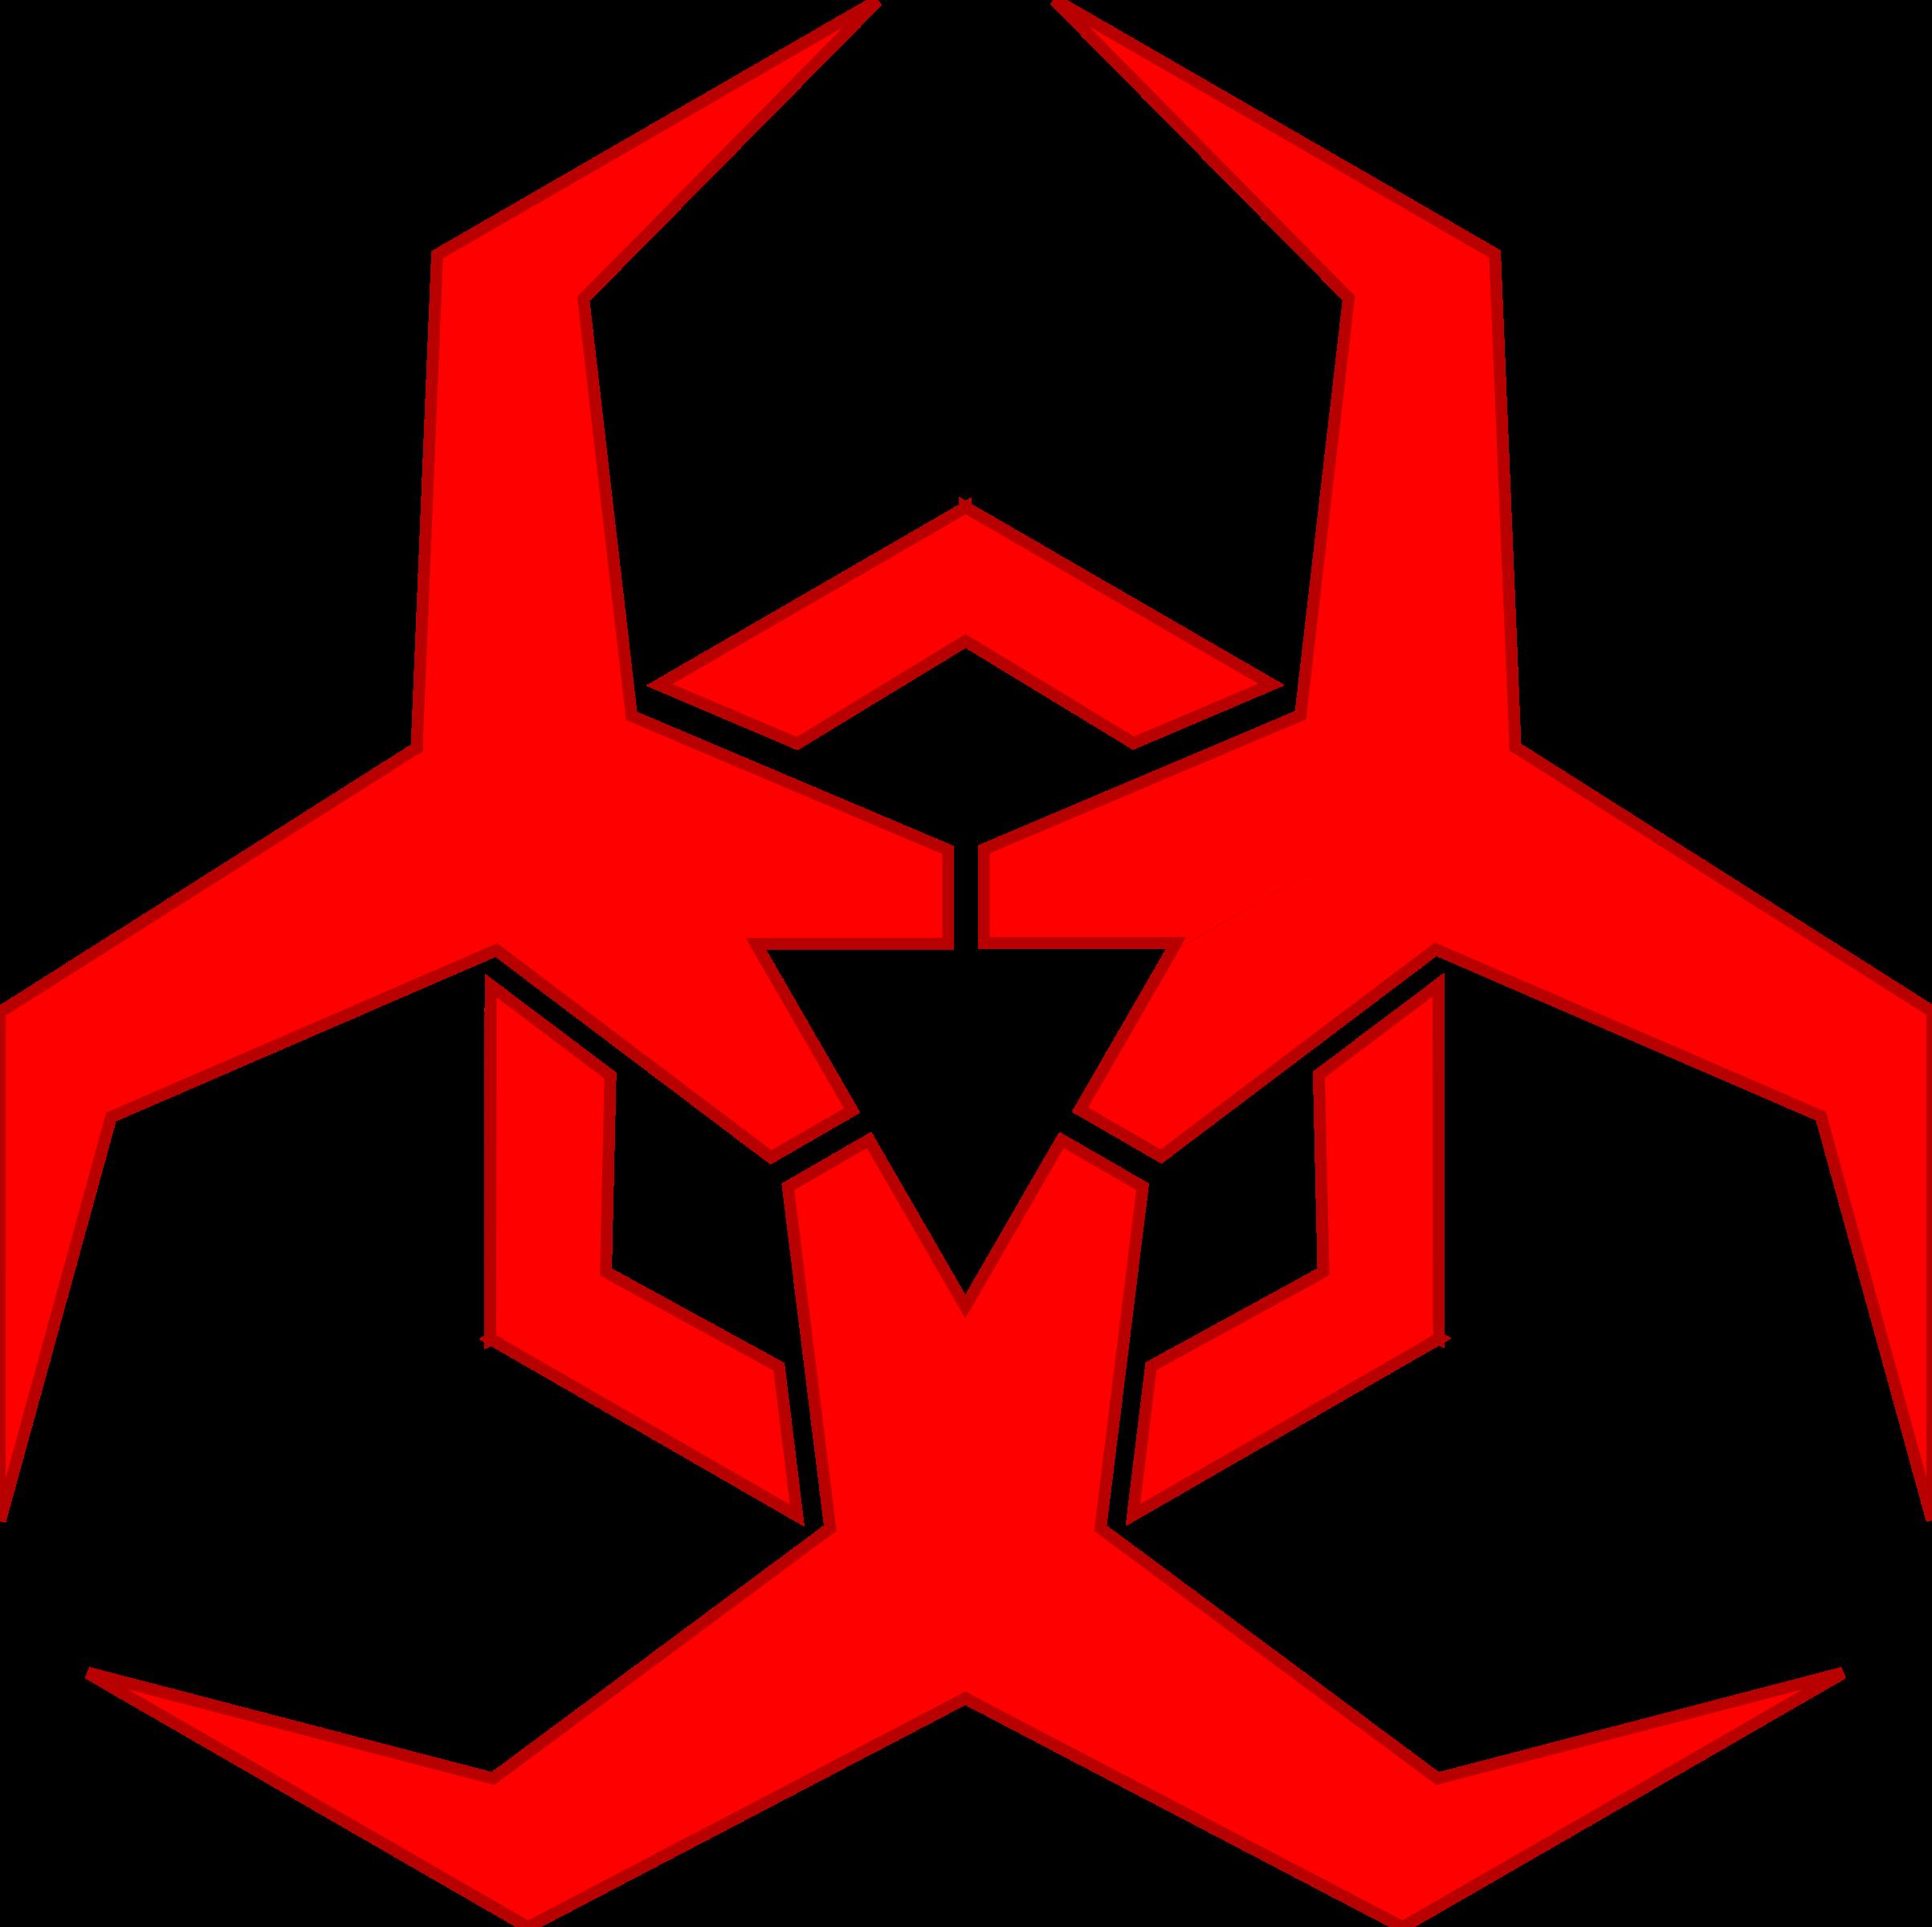 Explorer clipart compass star. Malware hazard symbol red